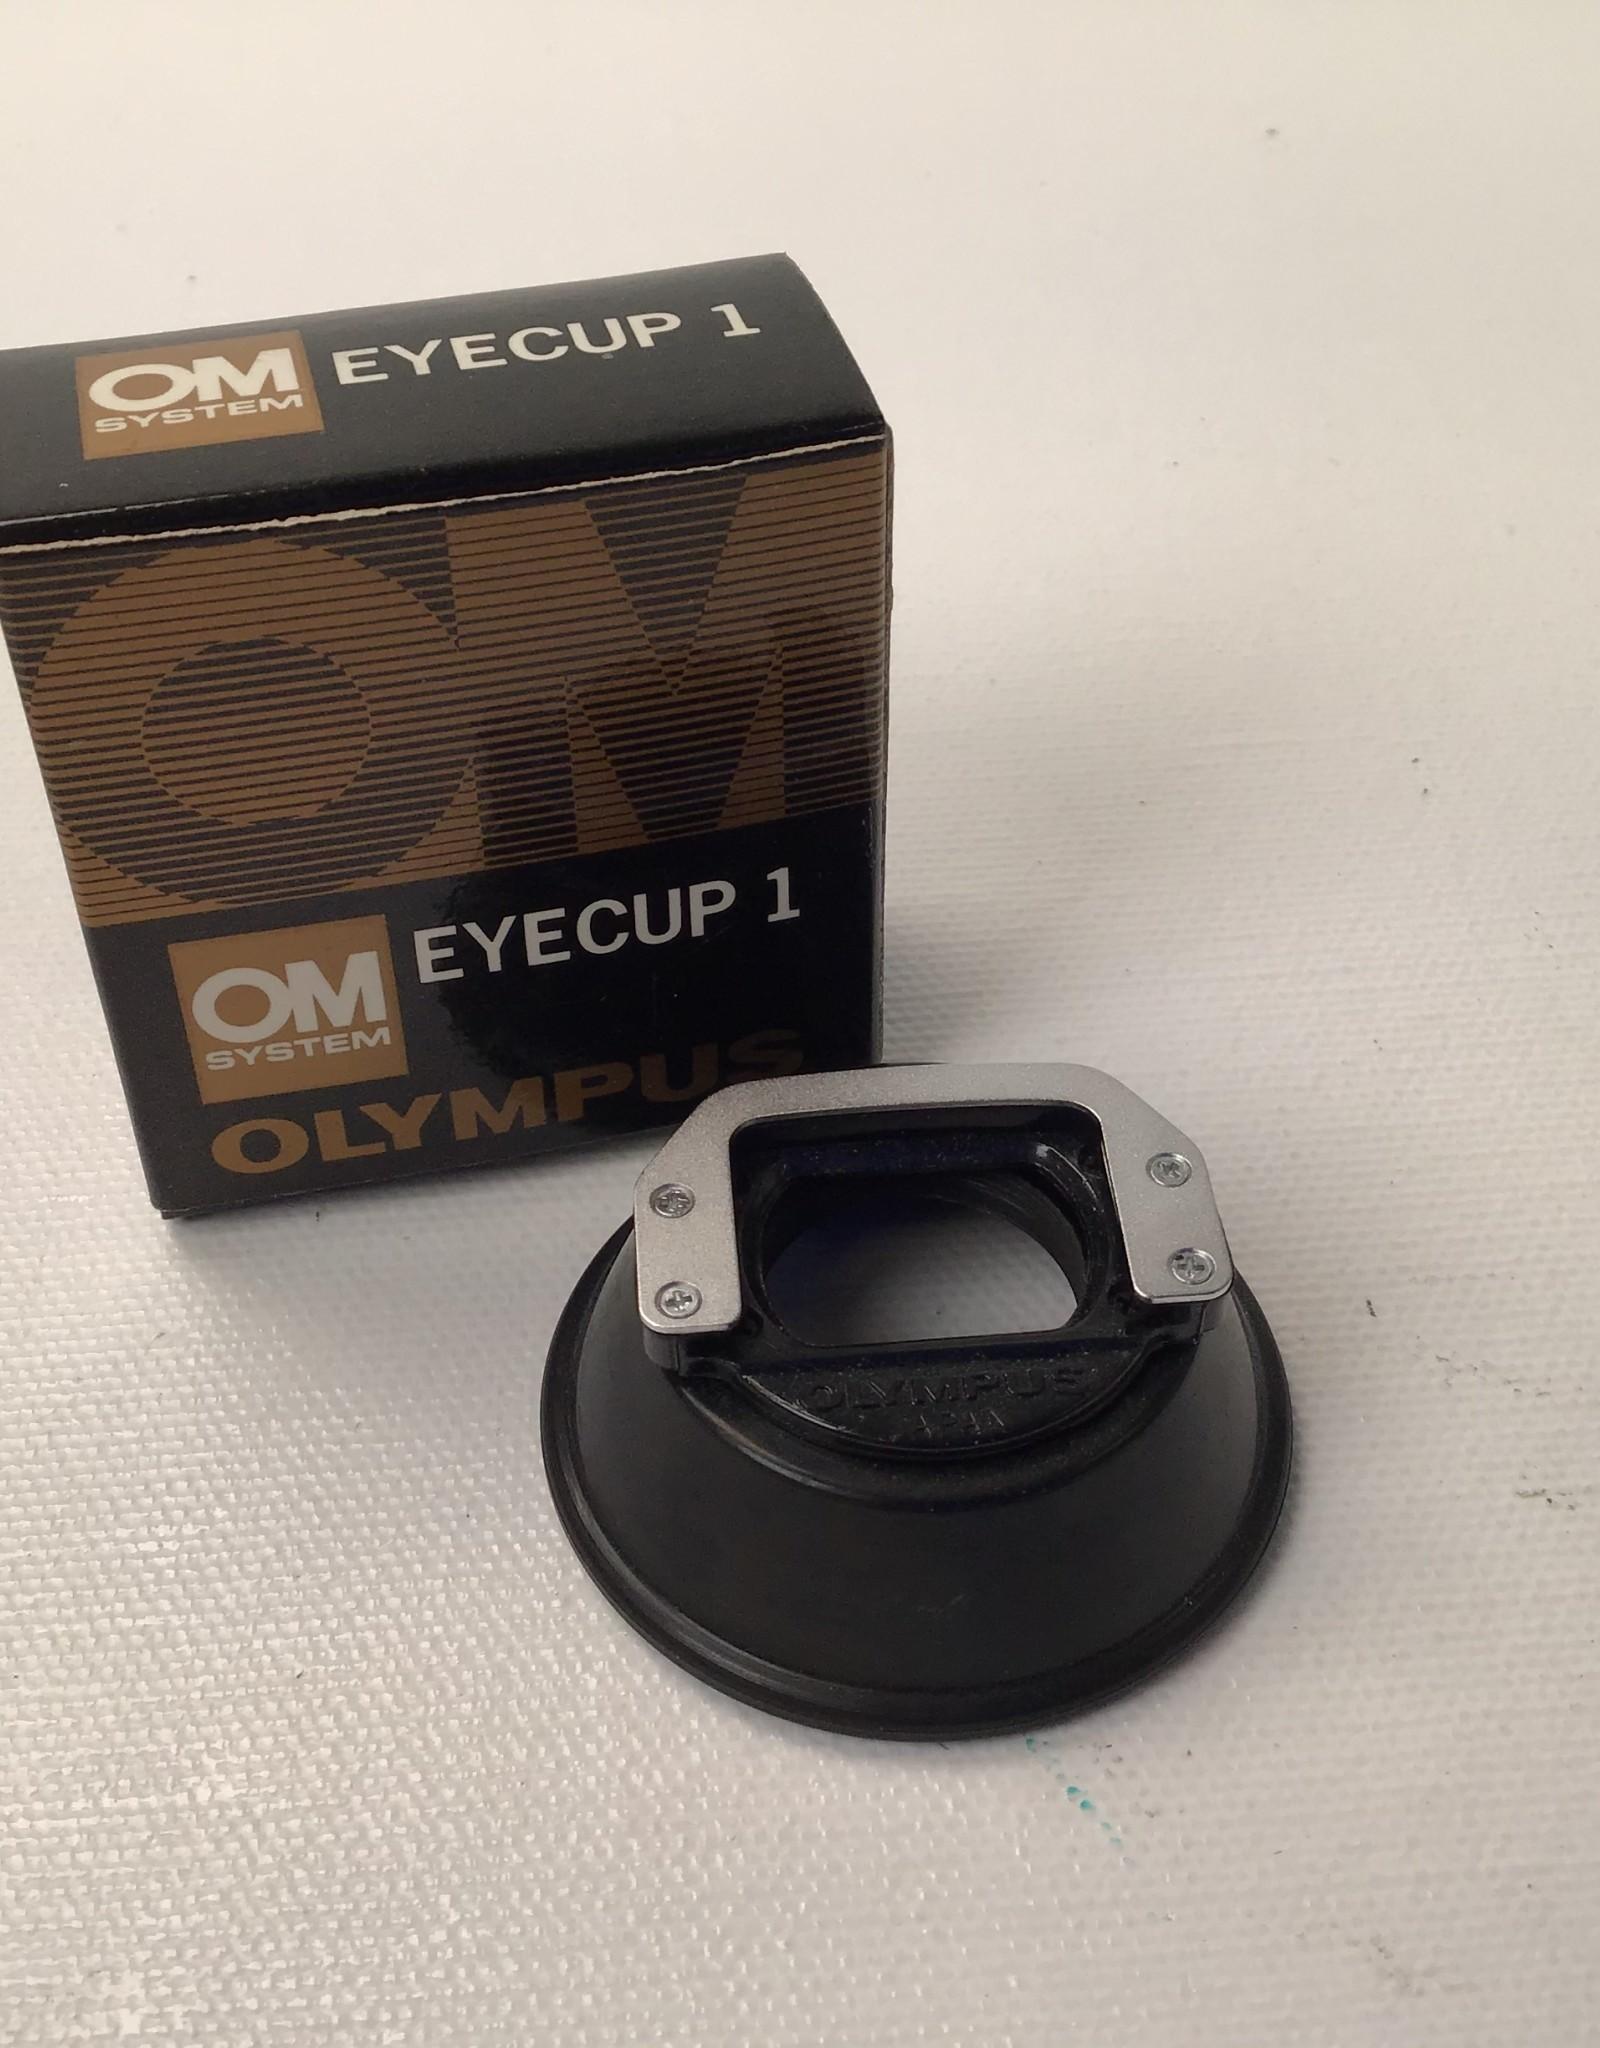 OLYMPUS Olympus OM Eyecup 1 in Box Used LN